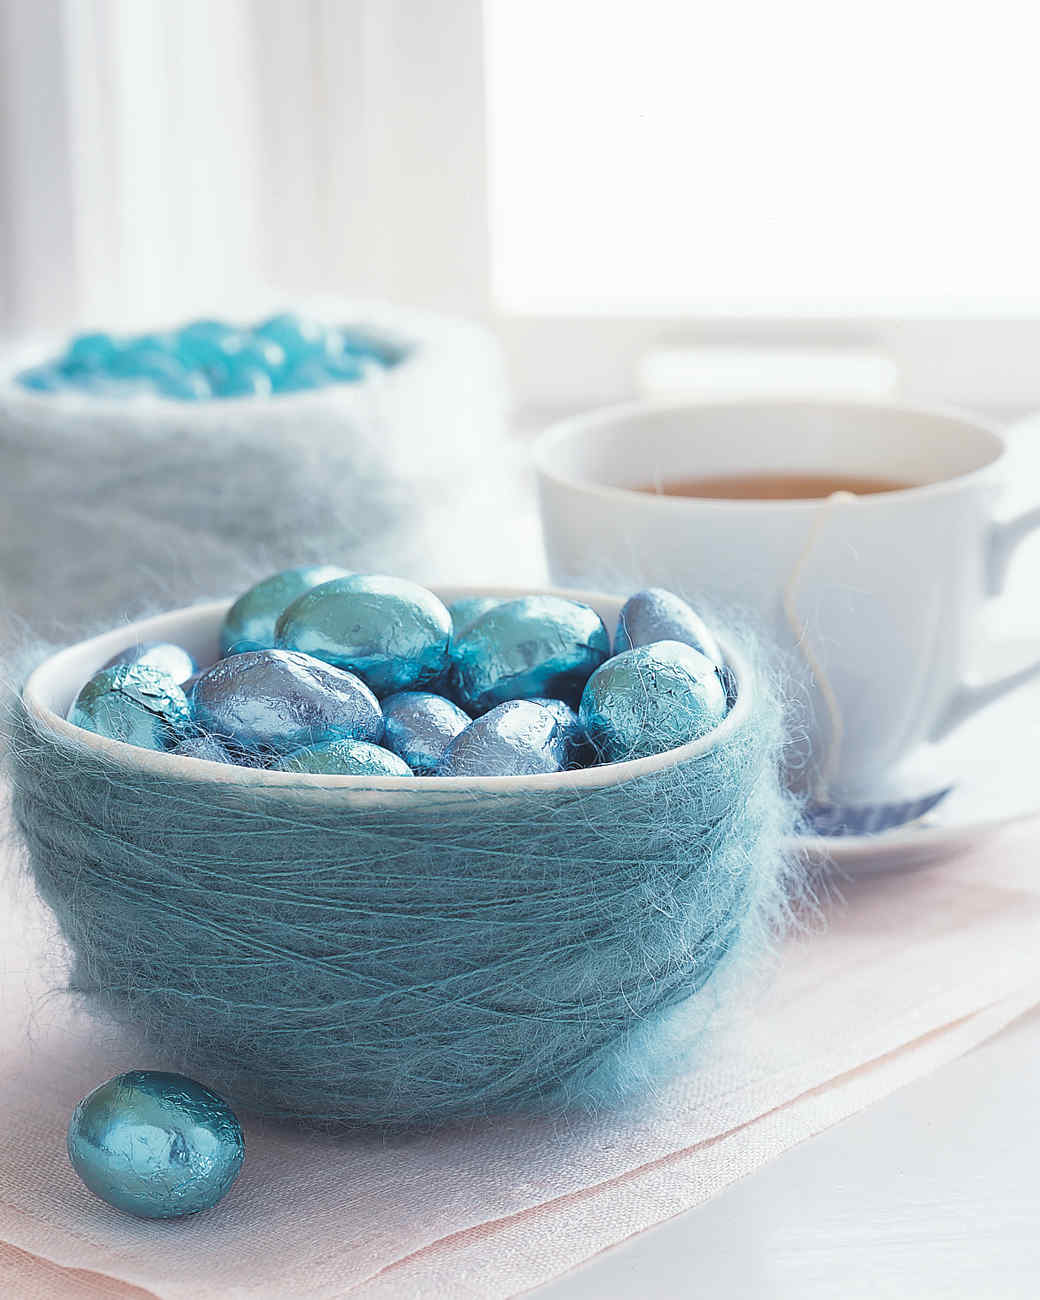 yarn-bowl-mmla102835.jpg